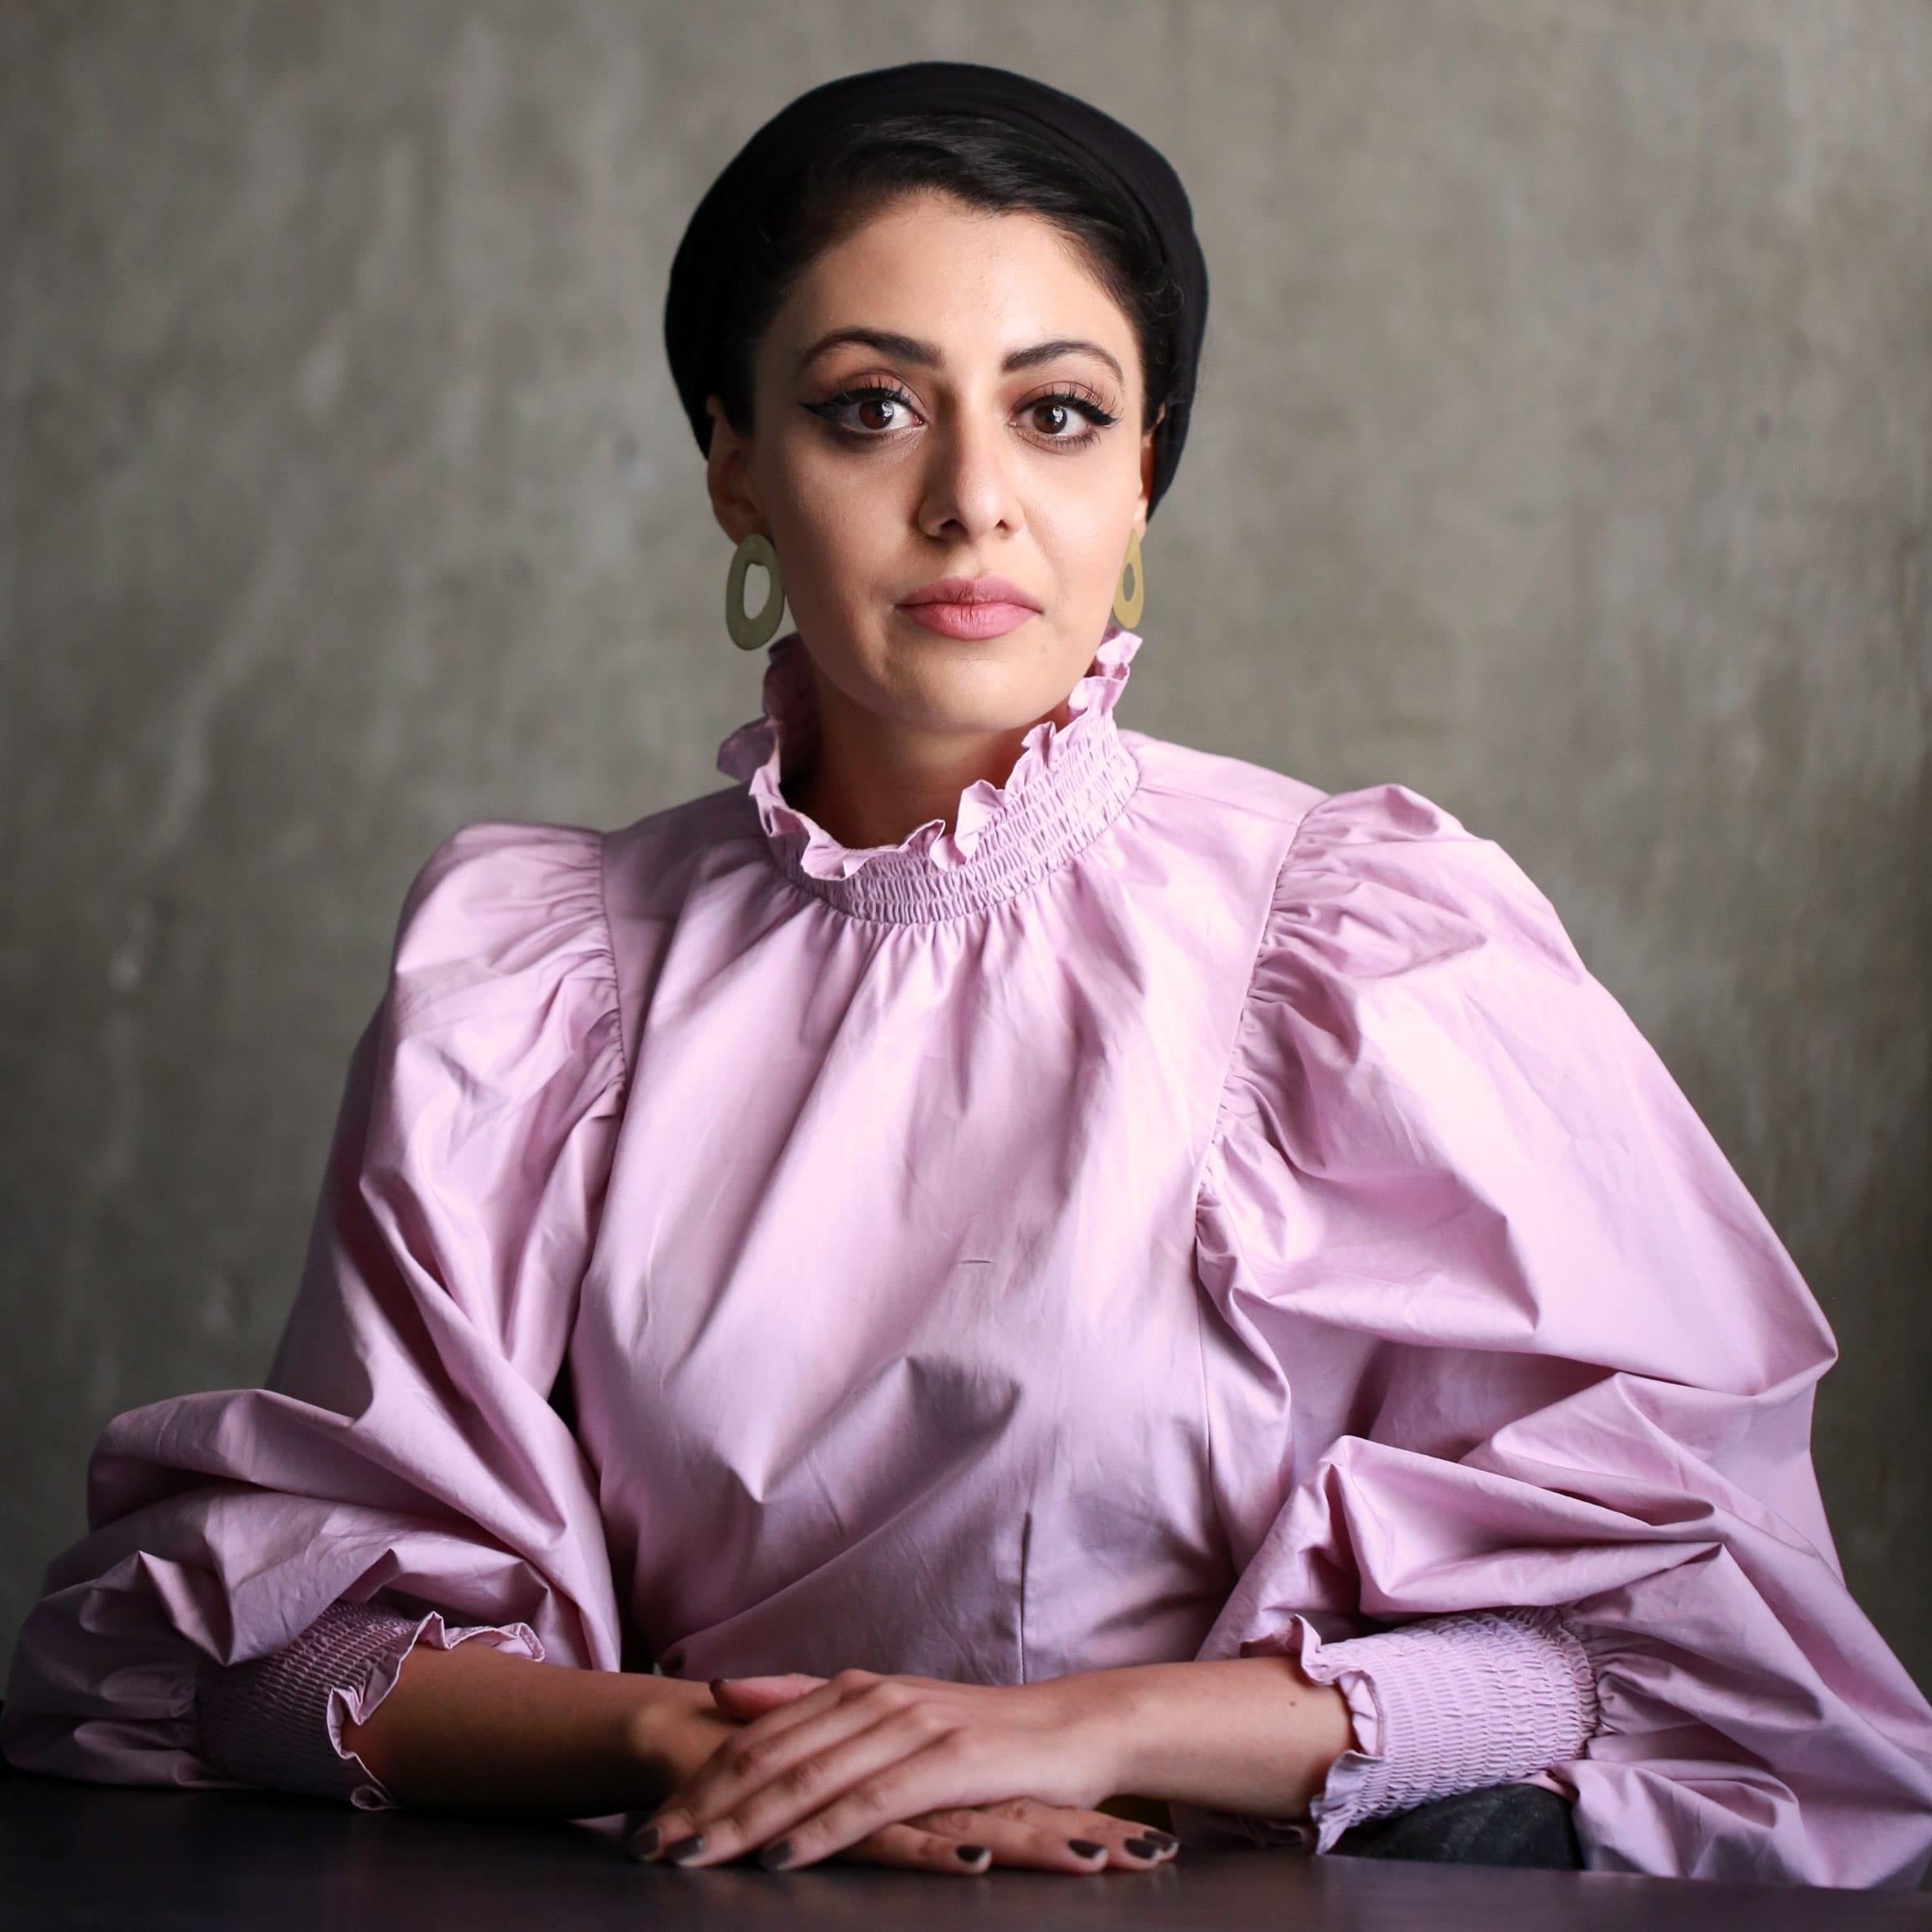 Sumayya Vally, director of Counterspace. Portrait by Dezeen